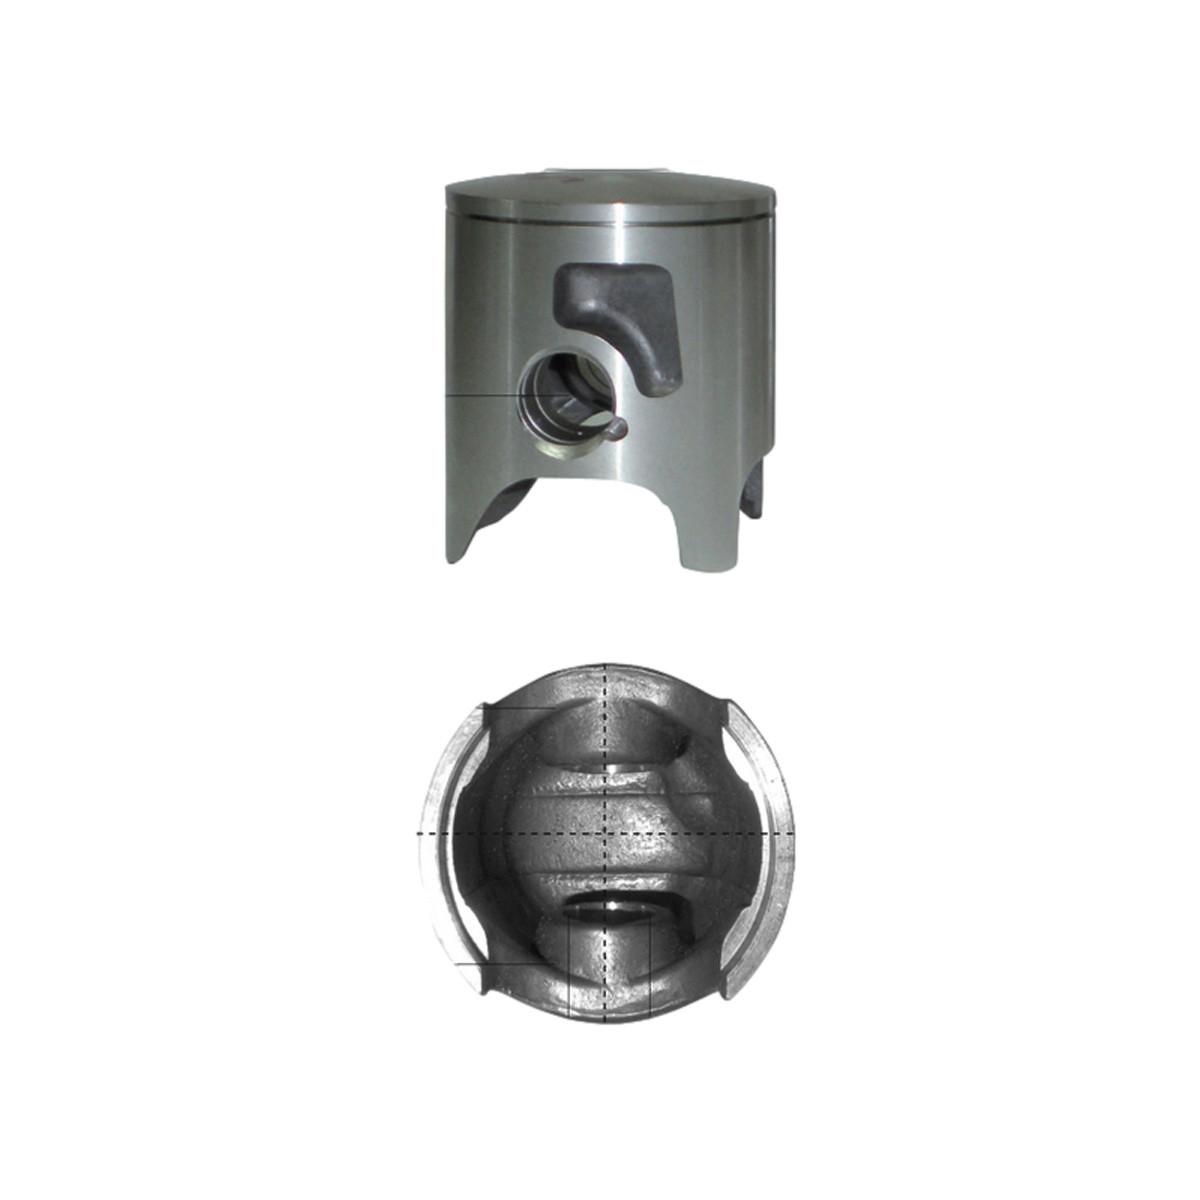 Piston DERBI Variant D.43.5mm - BARIKIT